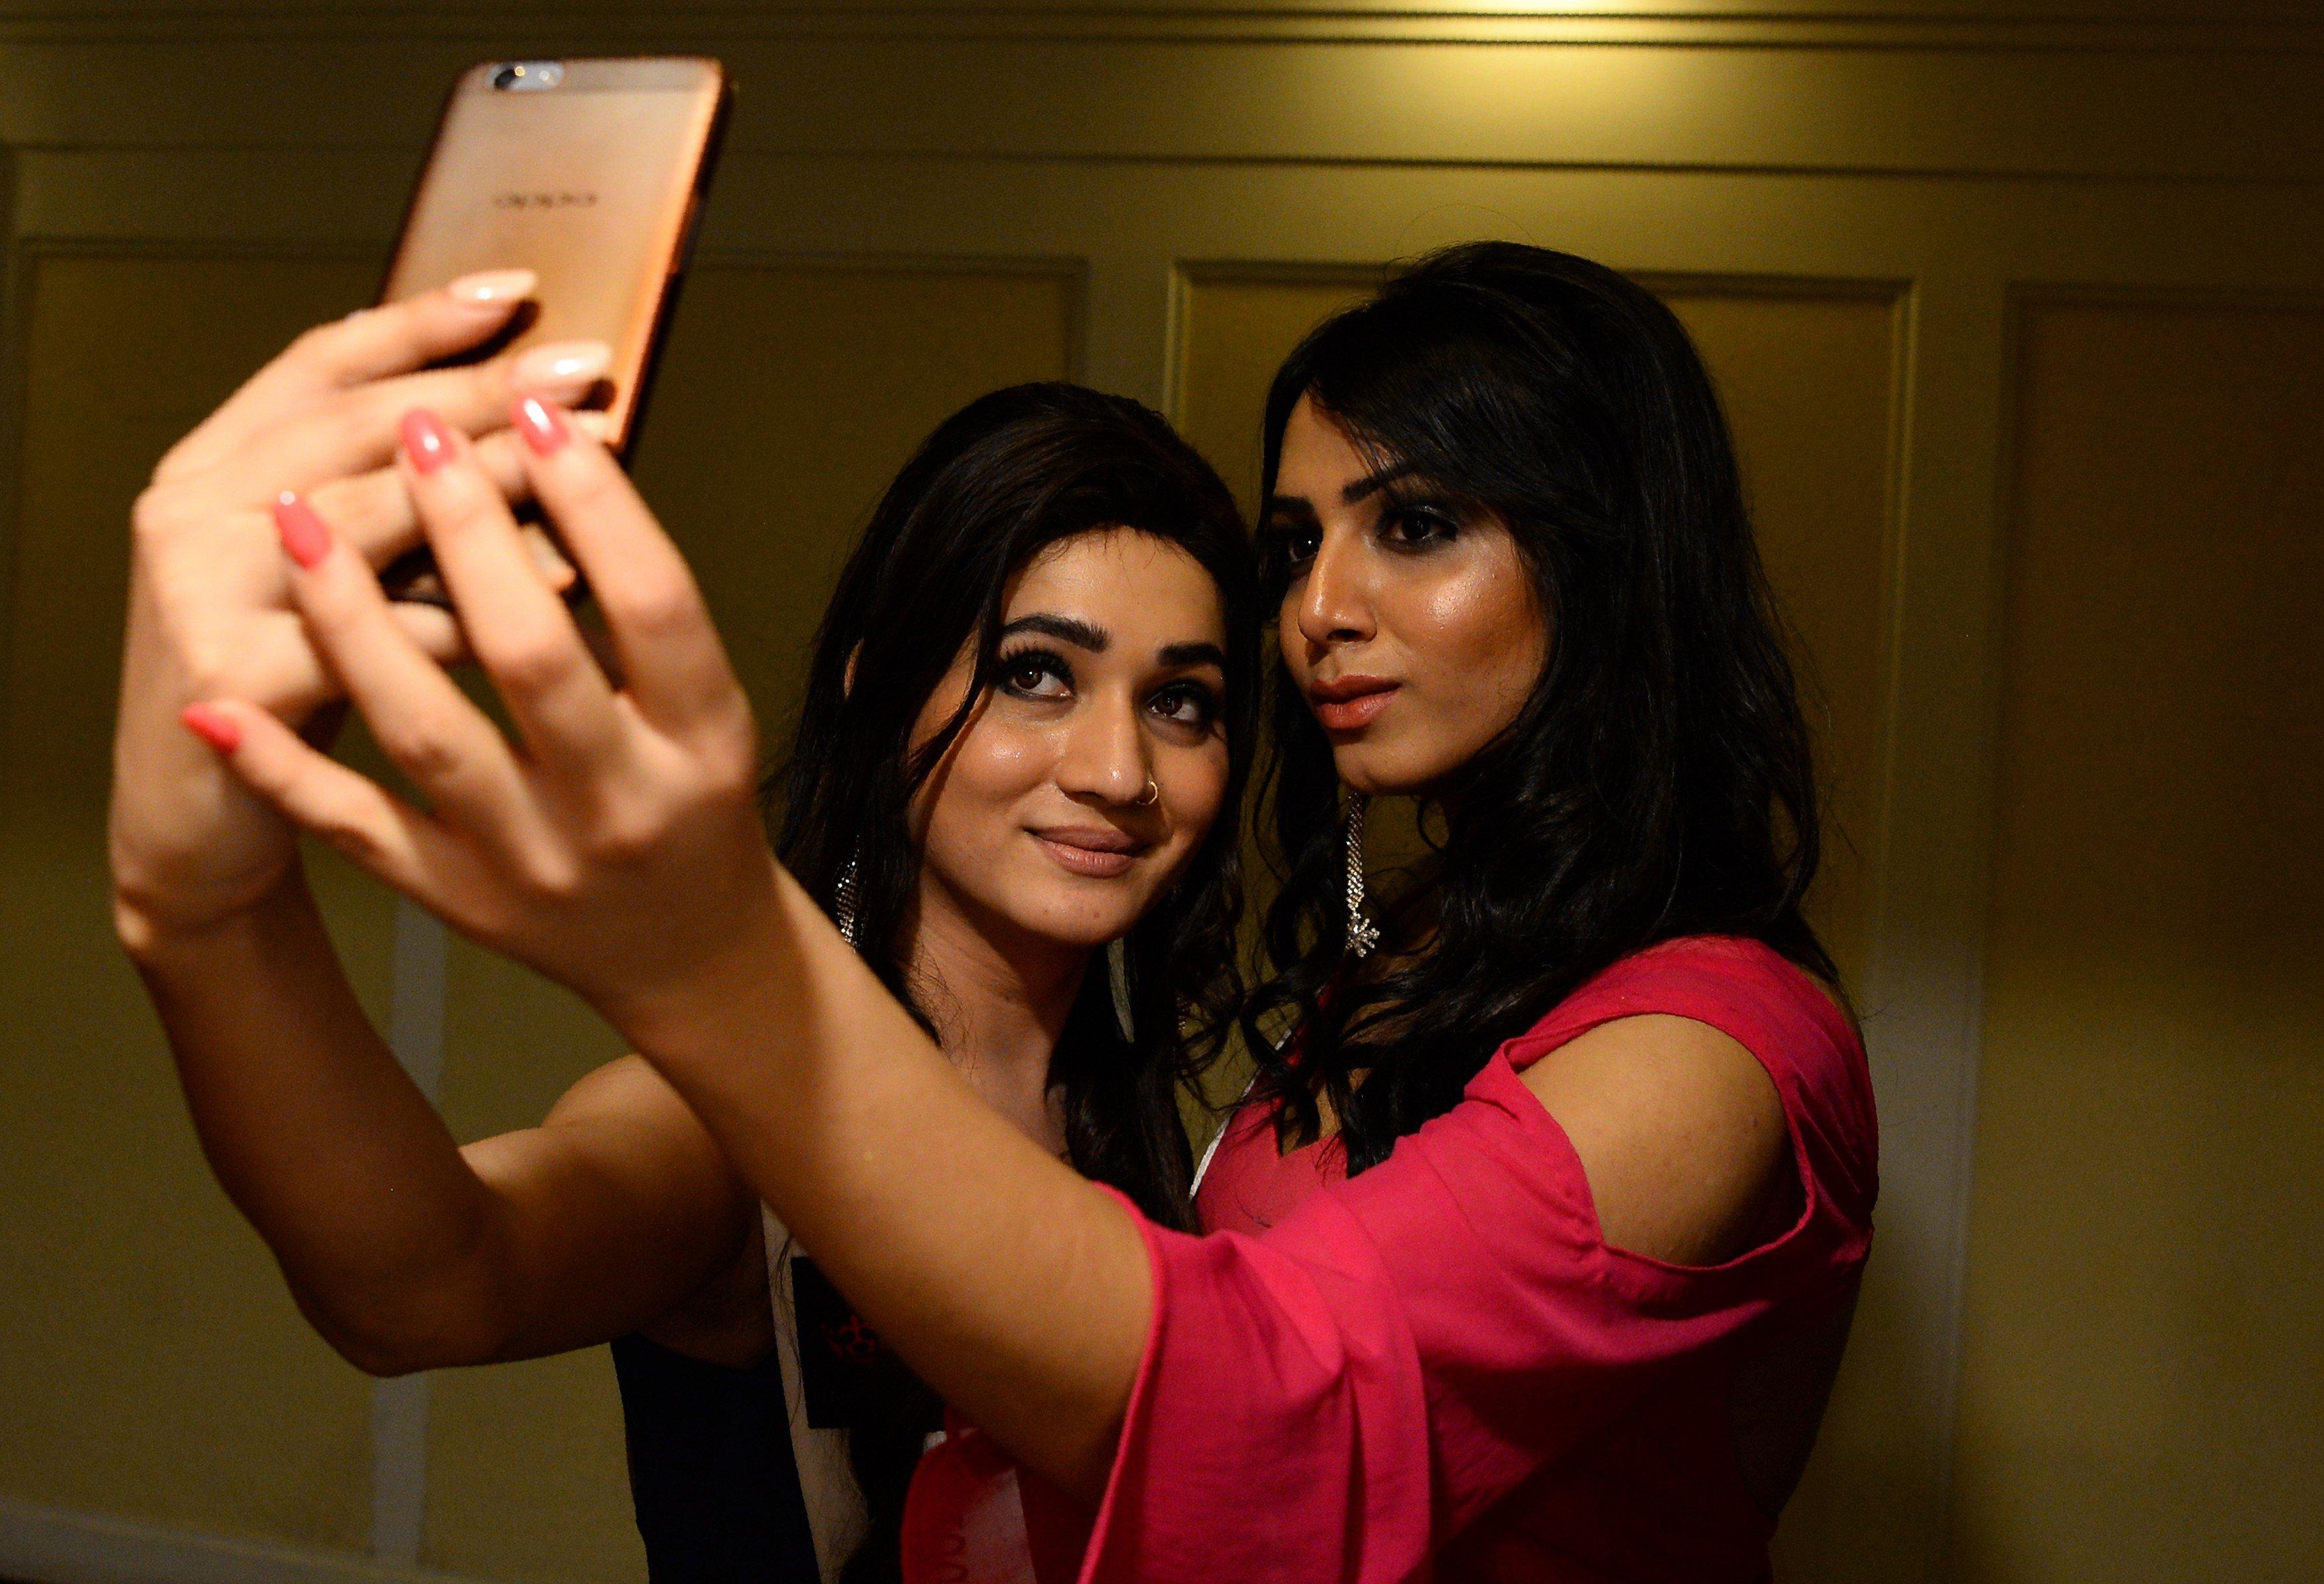 Hijra free mobile videos